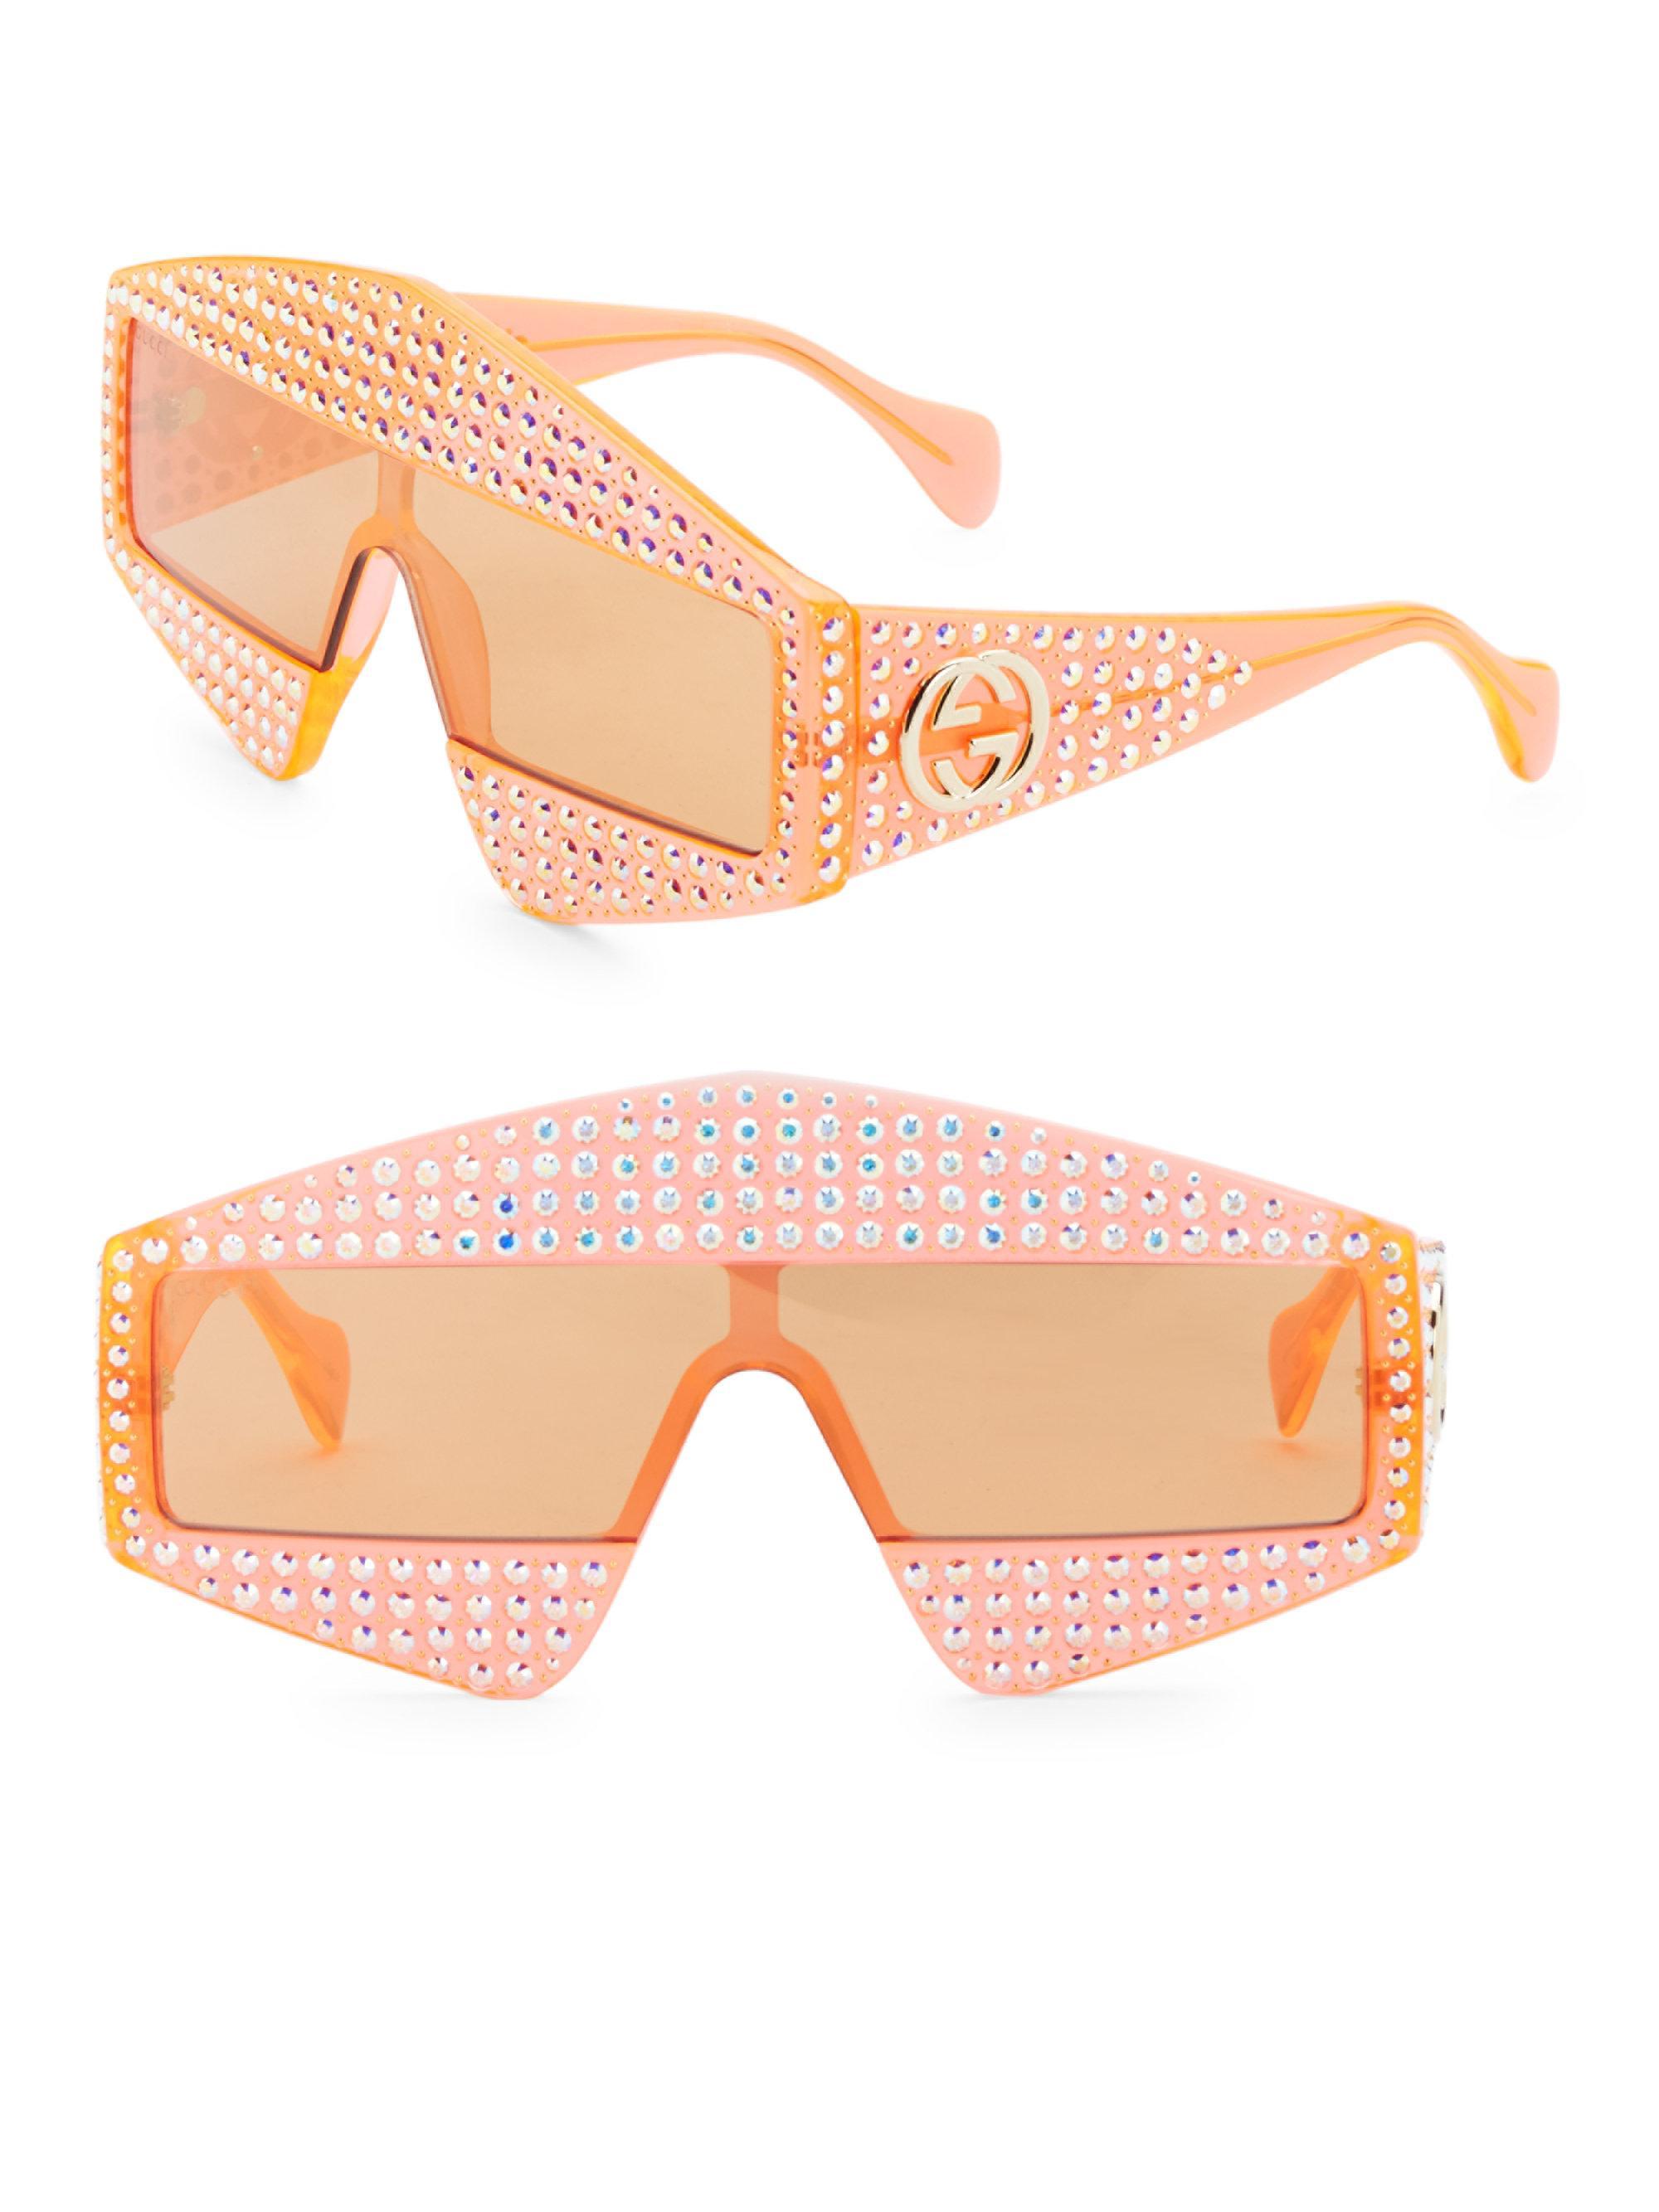 04bd4e971b4bd Gucci Women s Fashion Show Orange   Crystal Mask Sunglasses 99mm ...